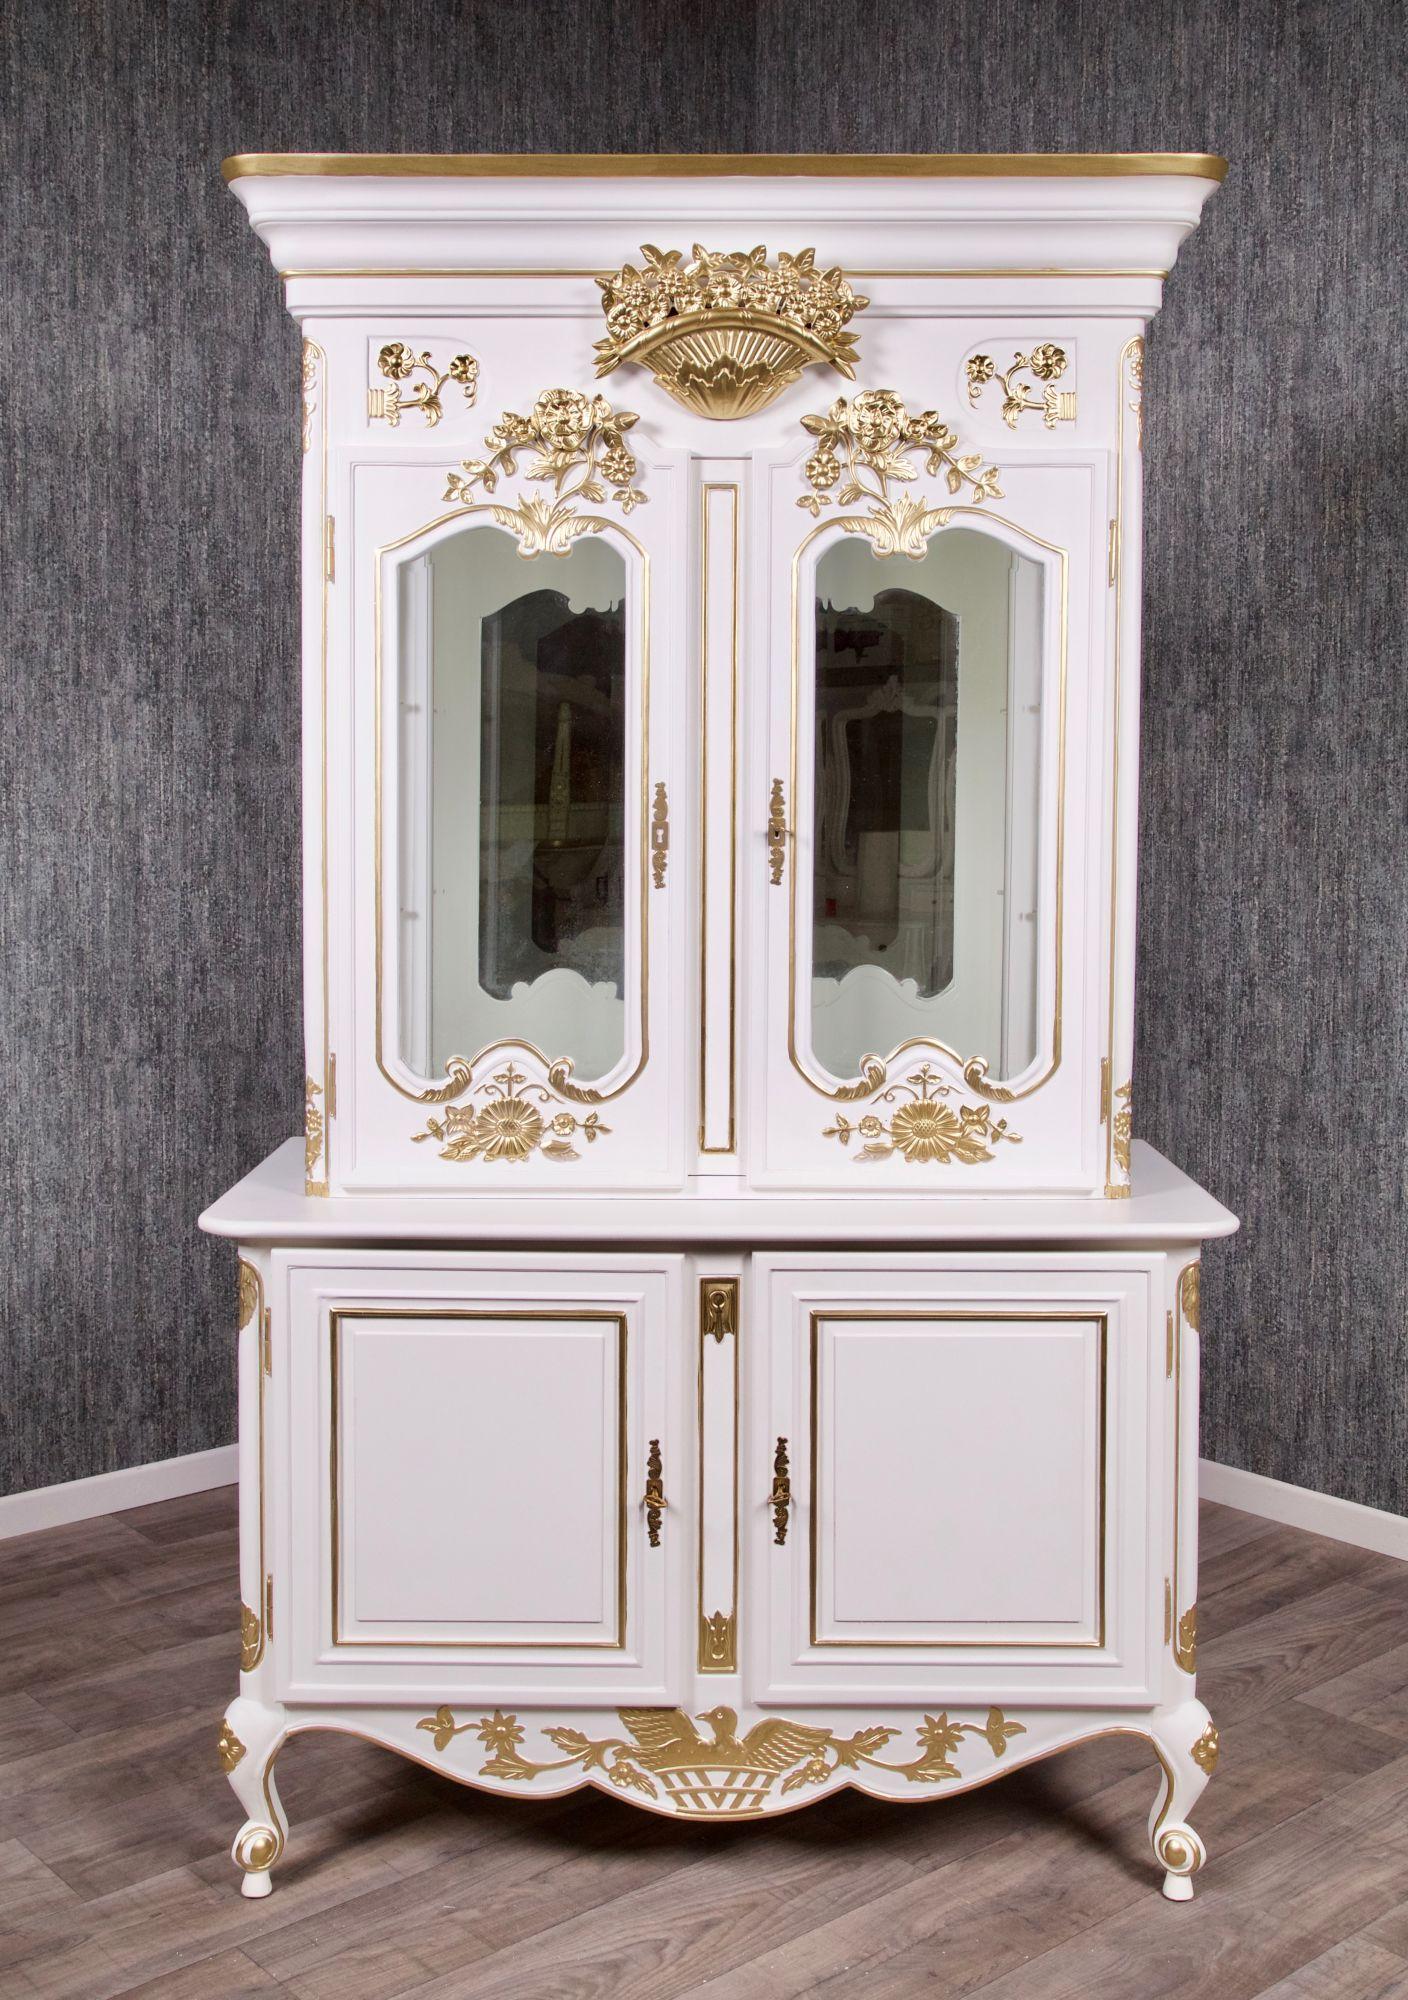 barock buffet rar 004 gs in wei mit starkem gold dekor. Black Bedroom Furniture Sets. Home Design Ideas